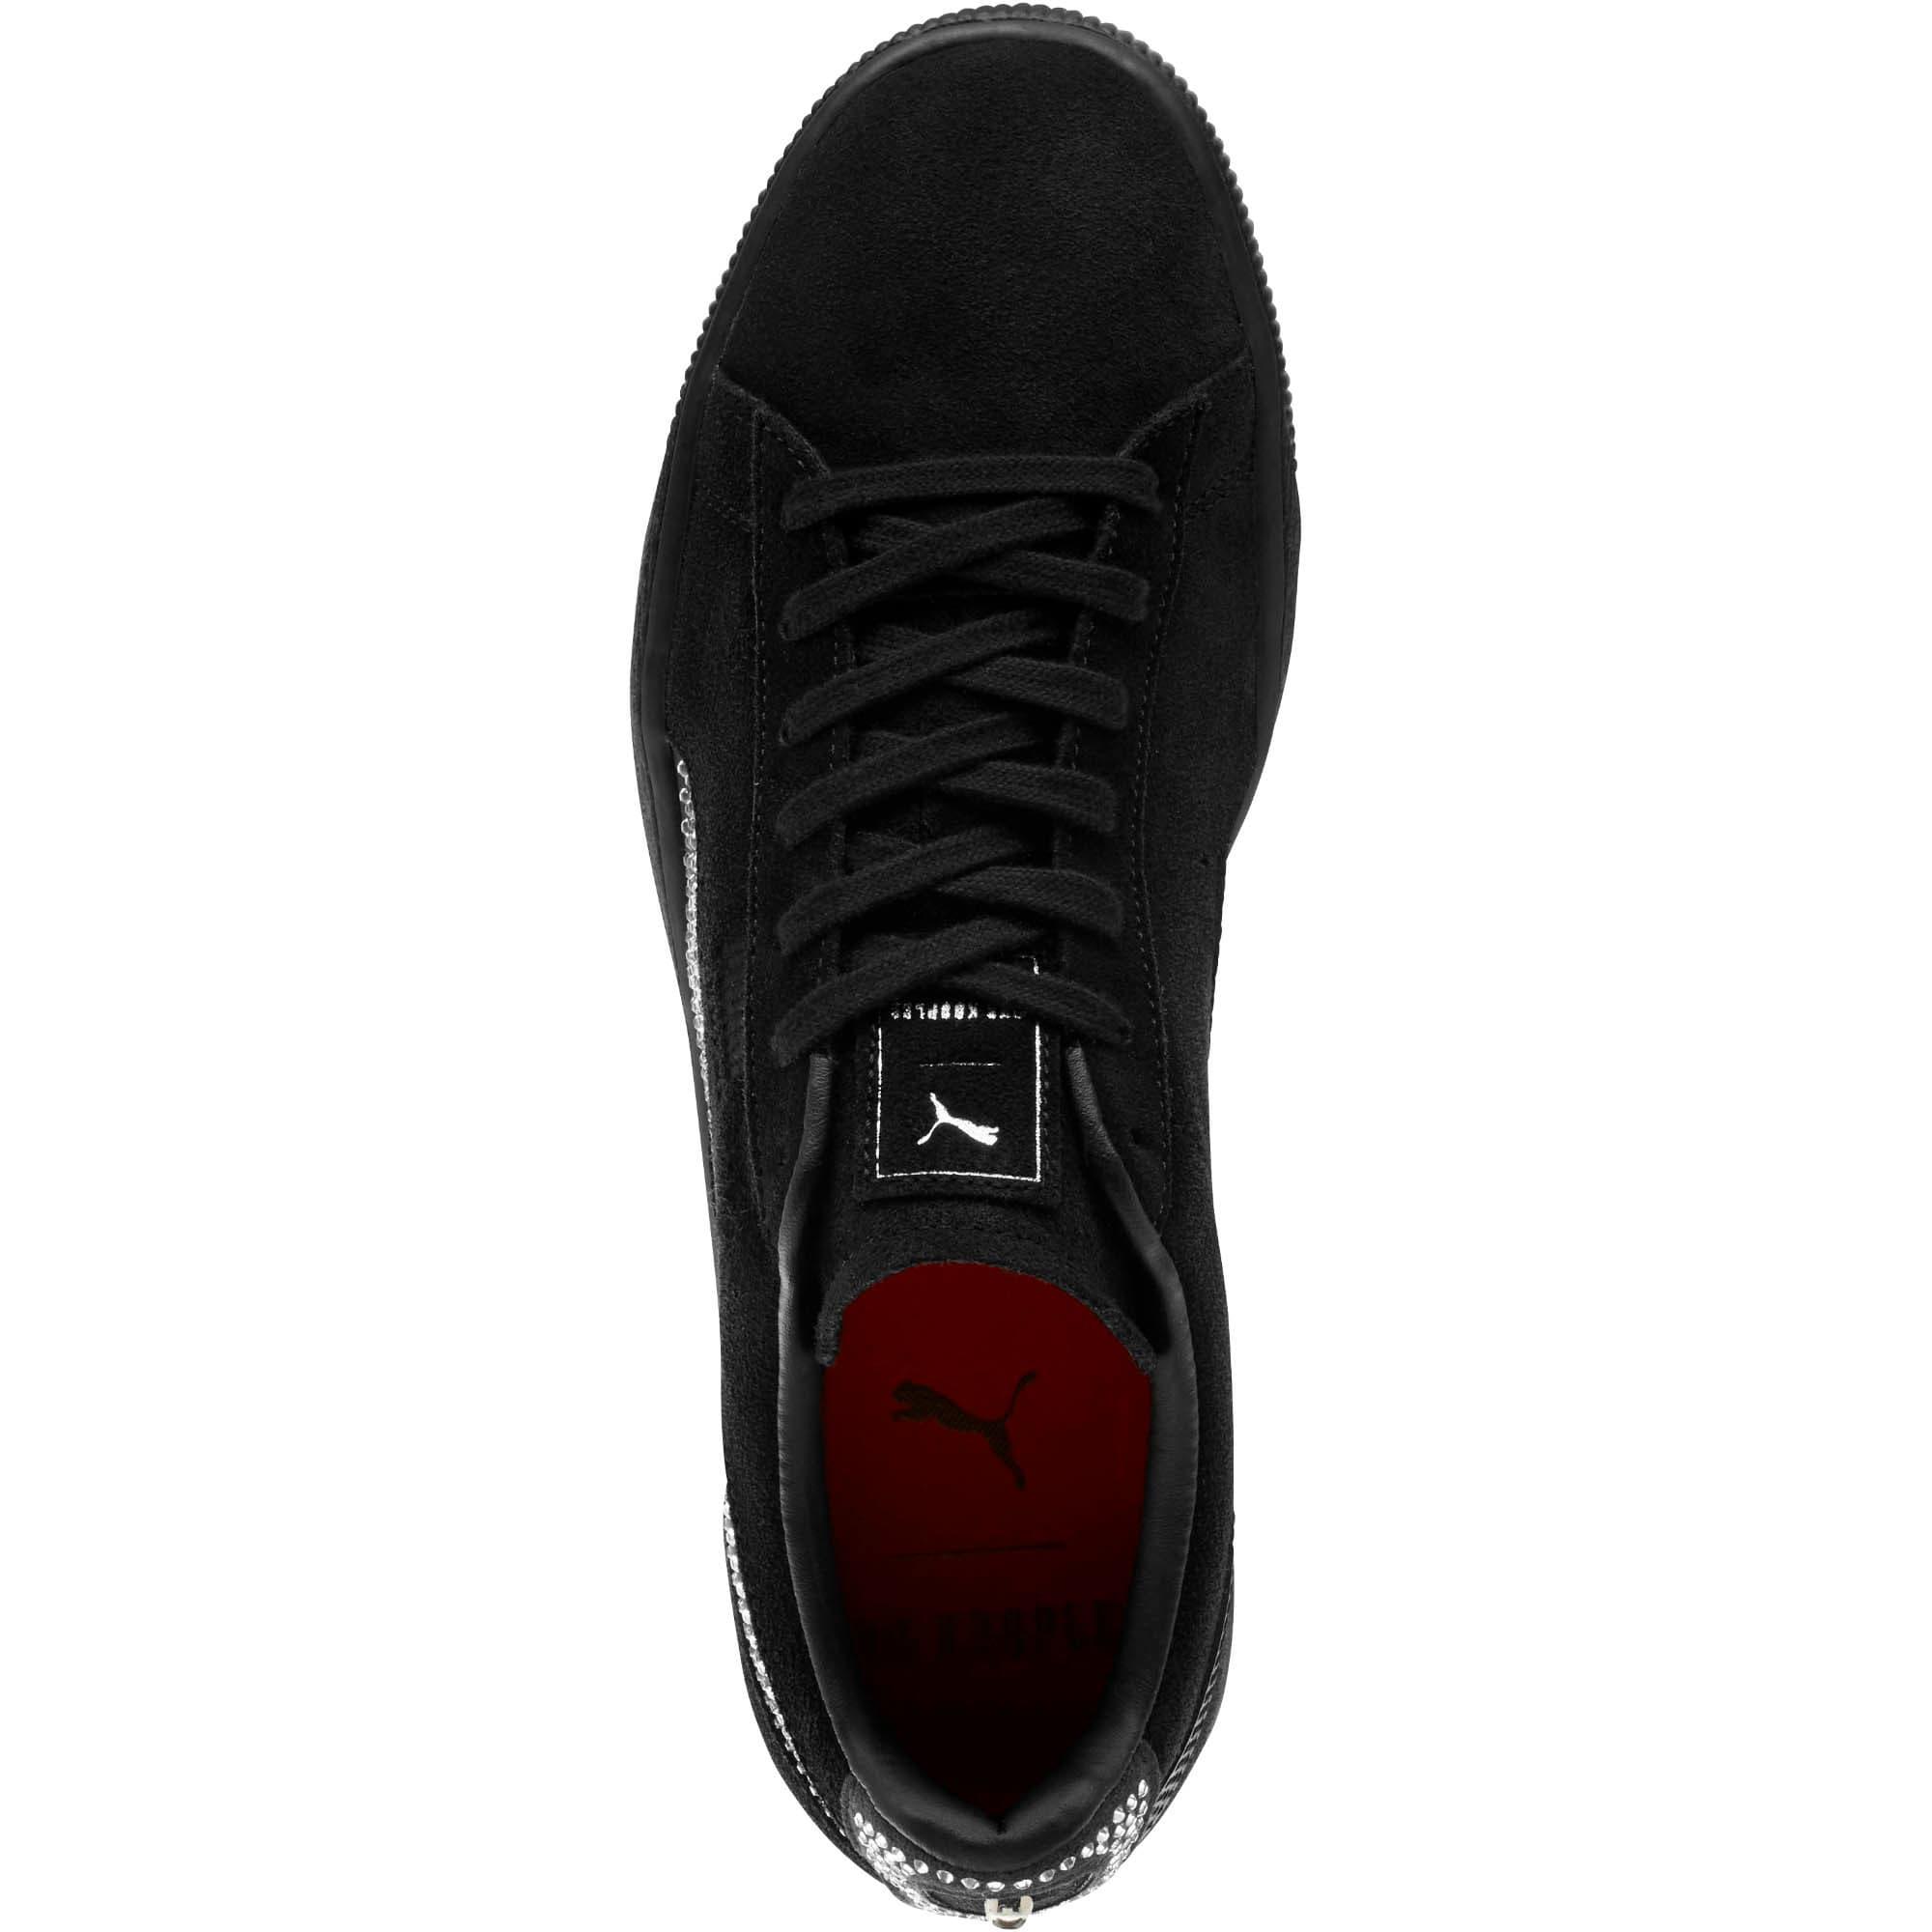 Miniatura 5 de Zapatos deportivos de gamuza PUMA x THE KOOPLES, Puma Black, mediano